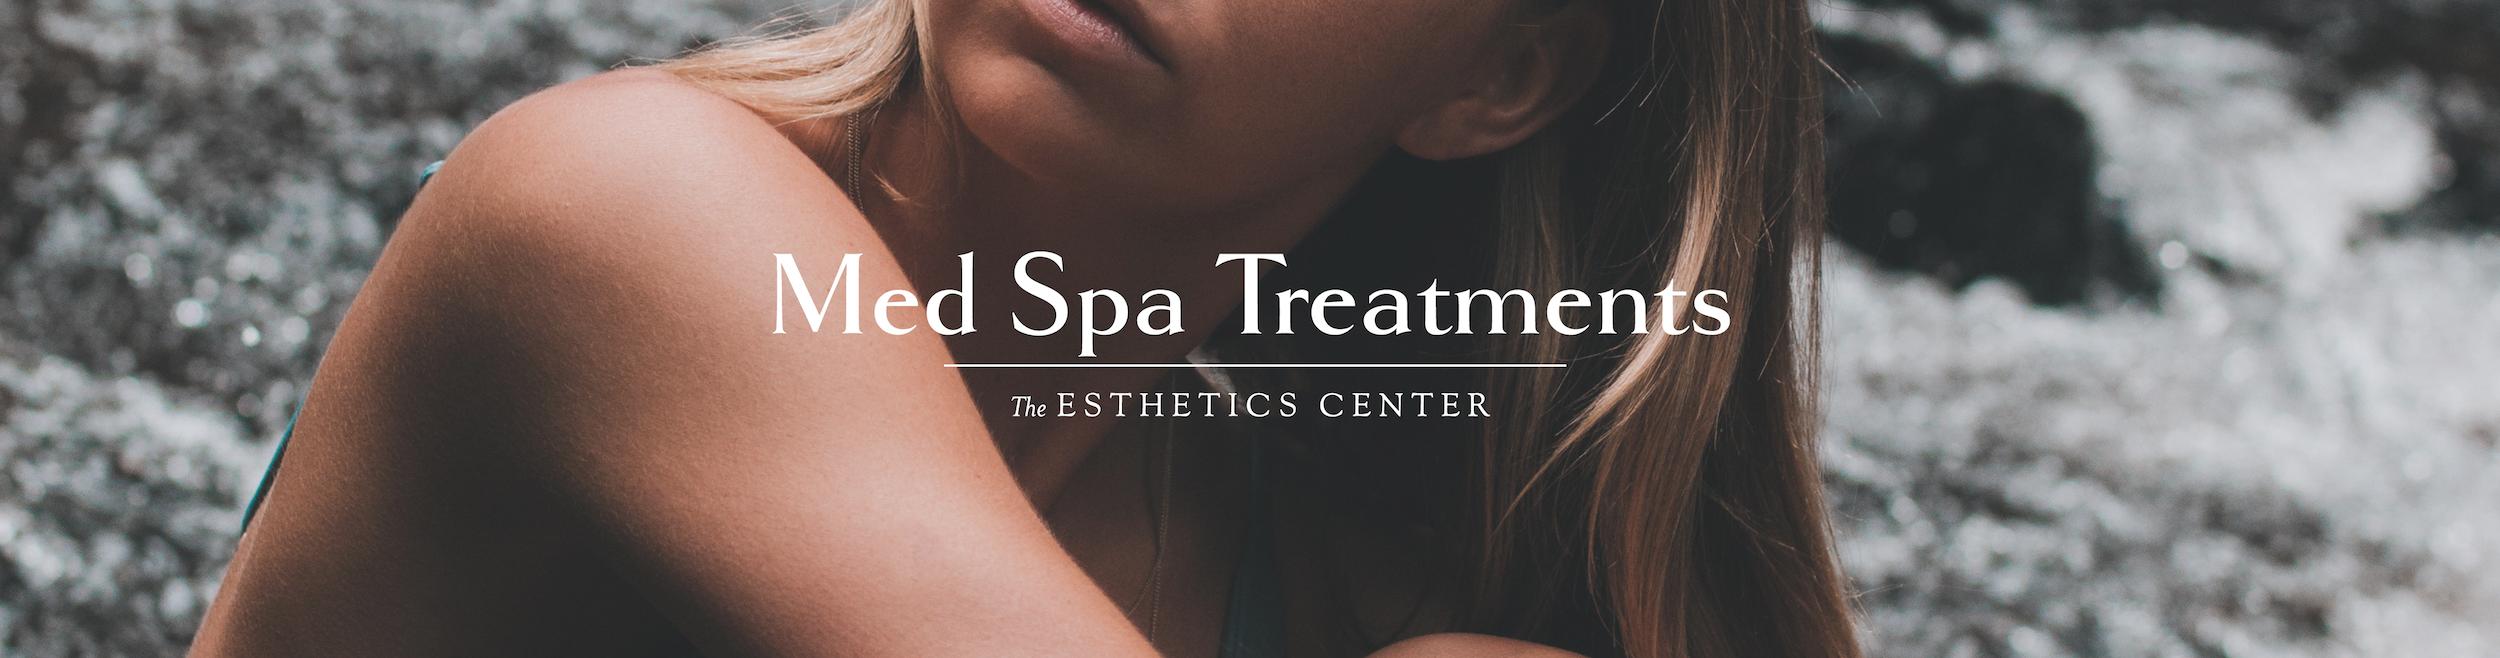 med-spa-treatments-banner.jpg